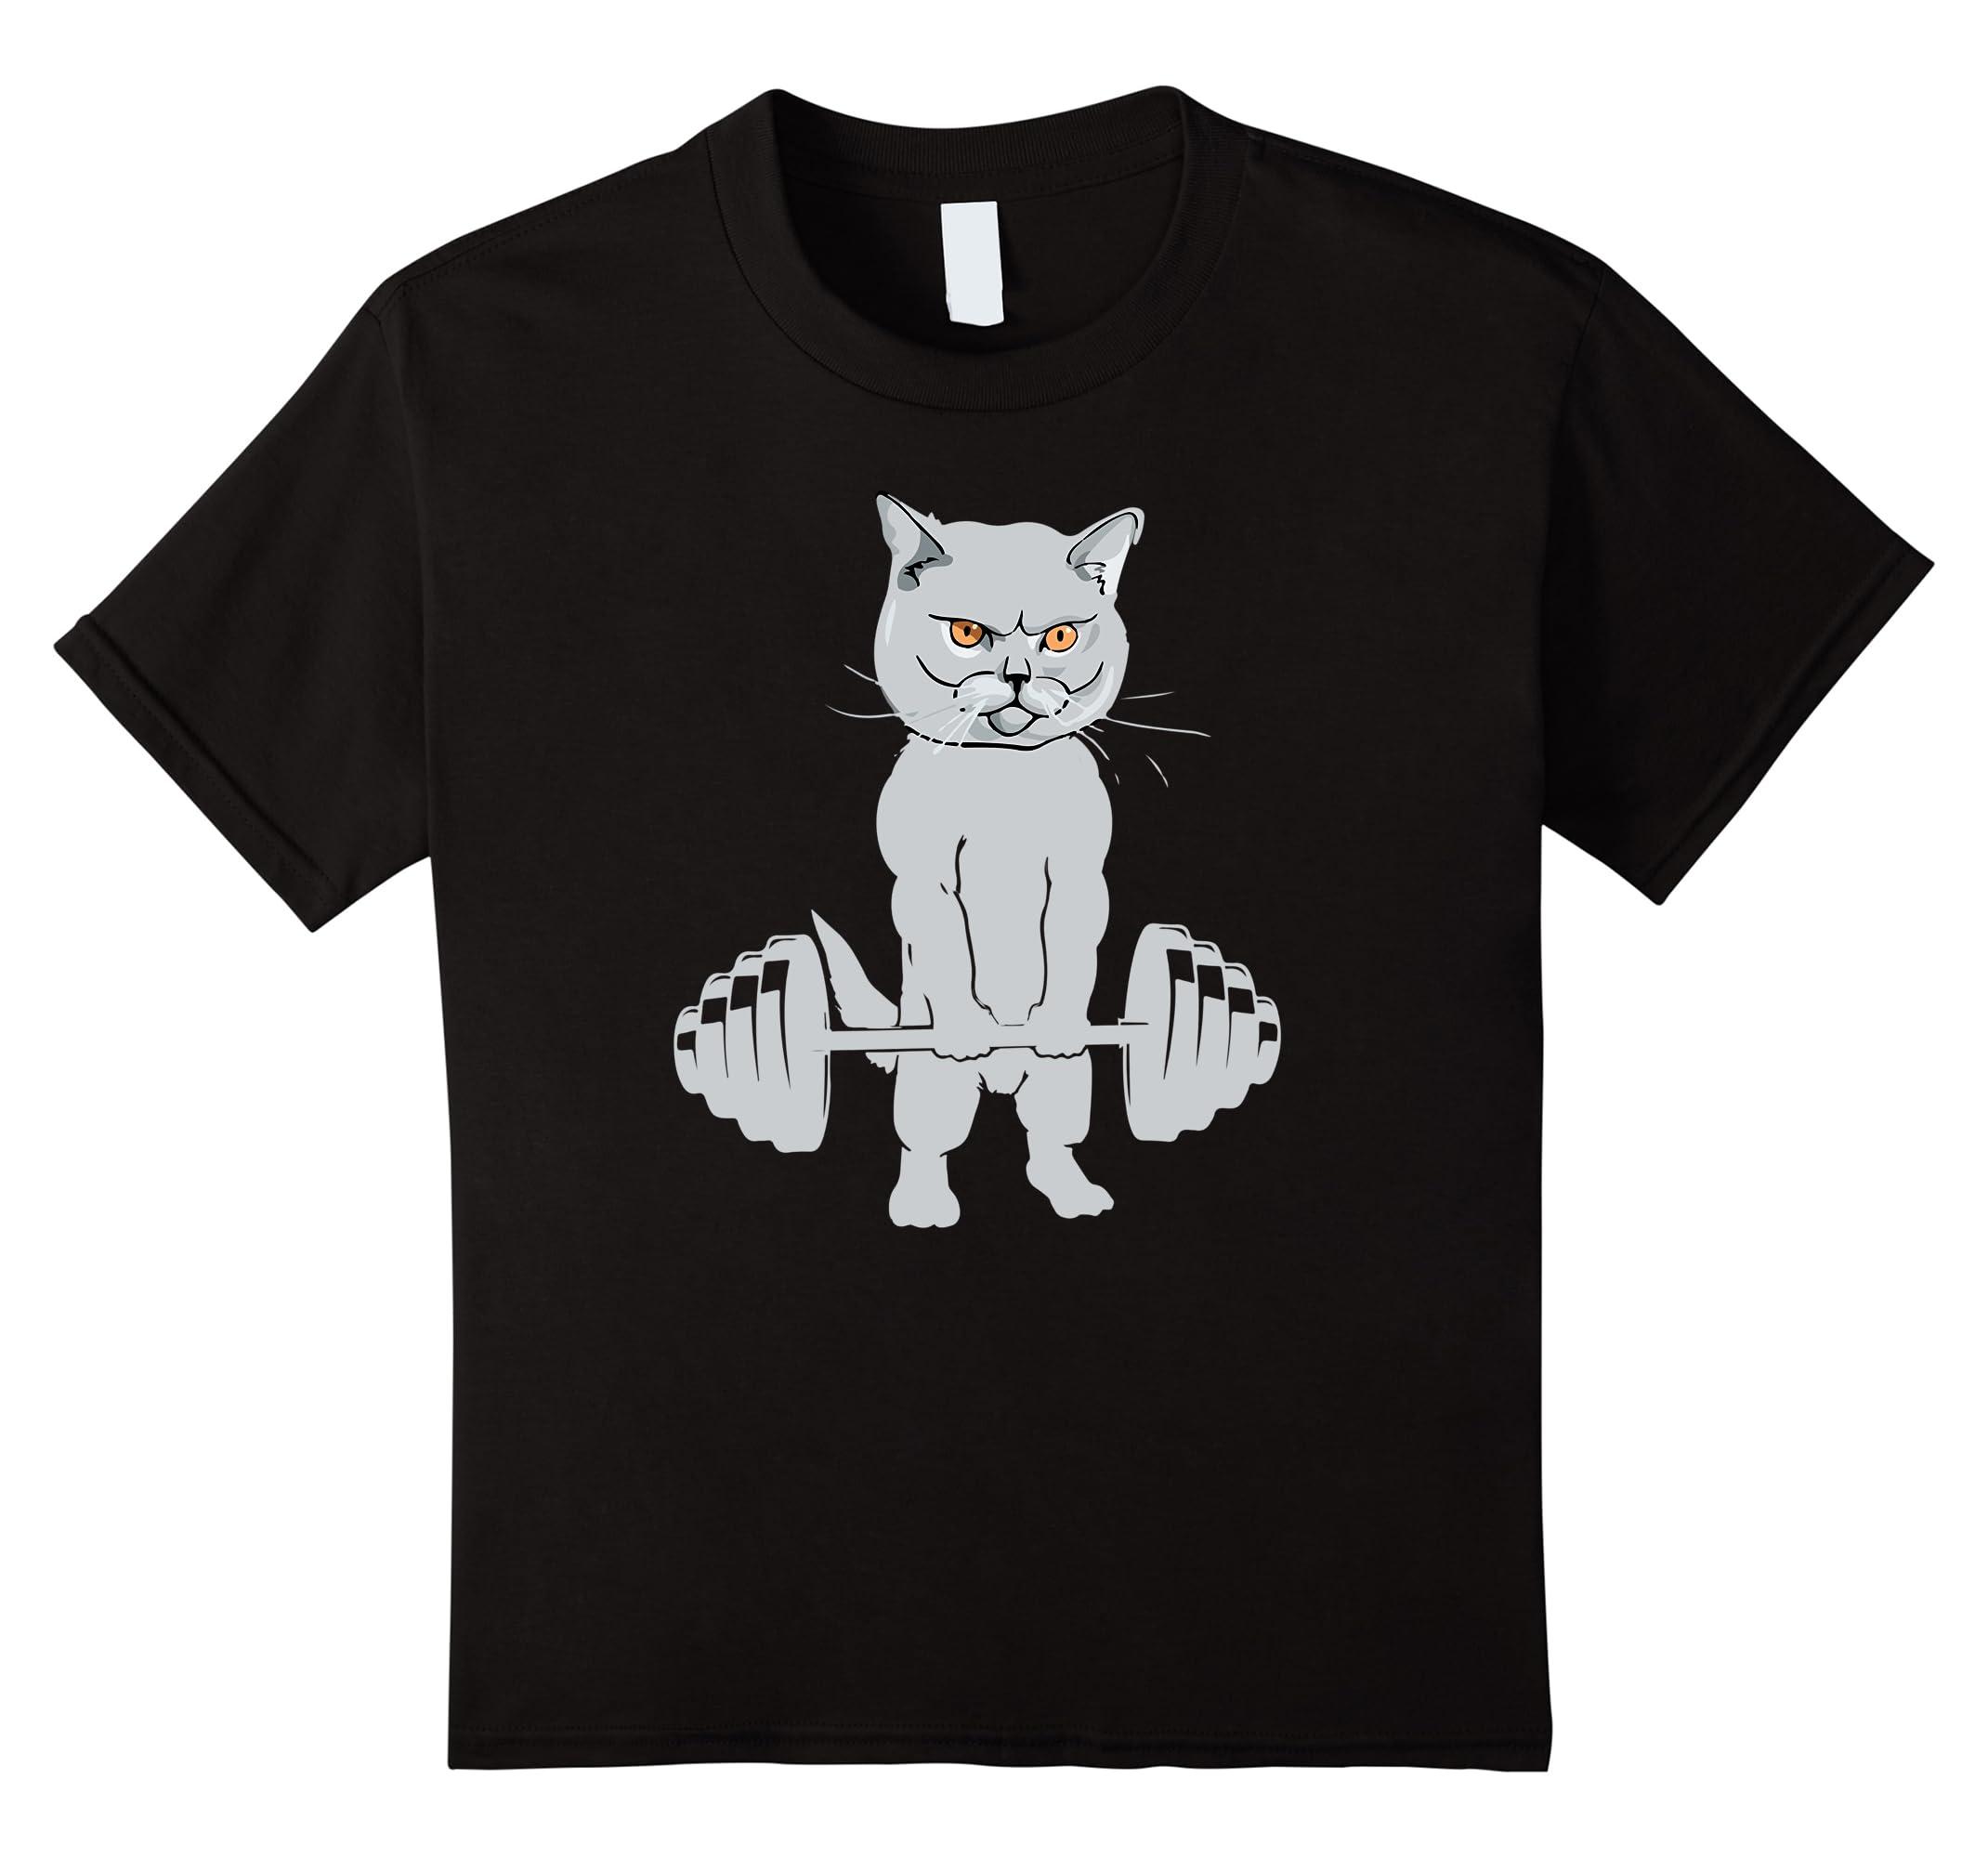 Cat Deadlift Powerlifting T Shirt Lover-Awarplus